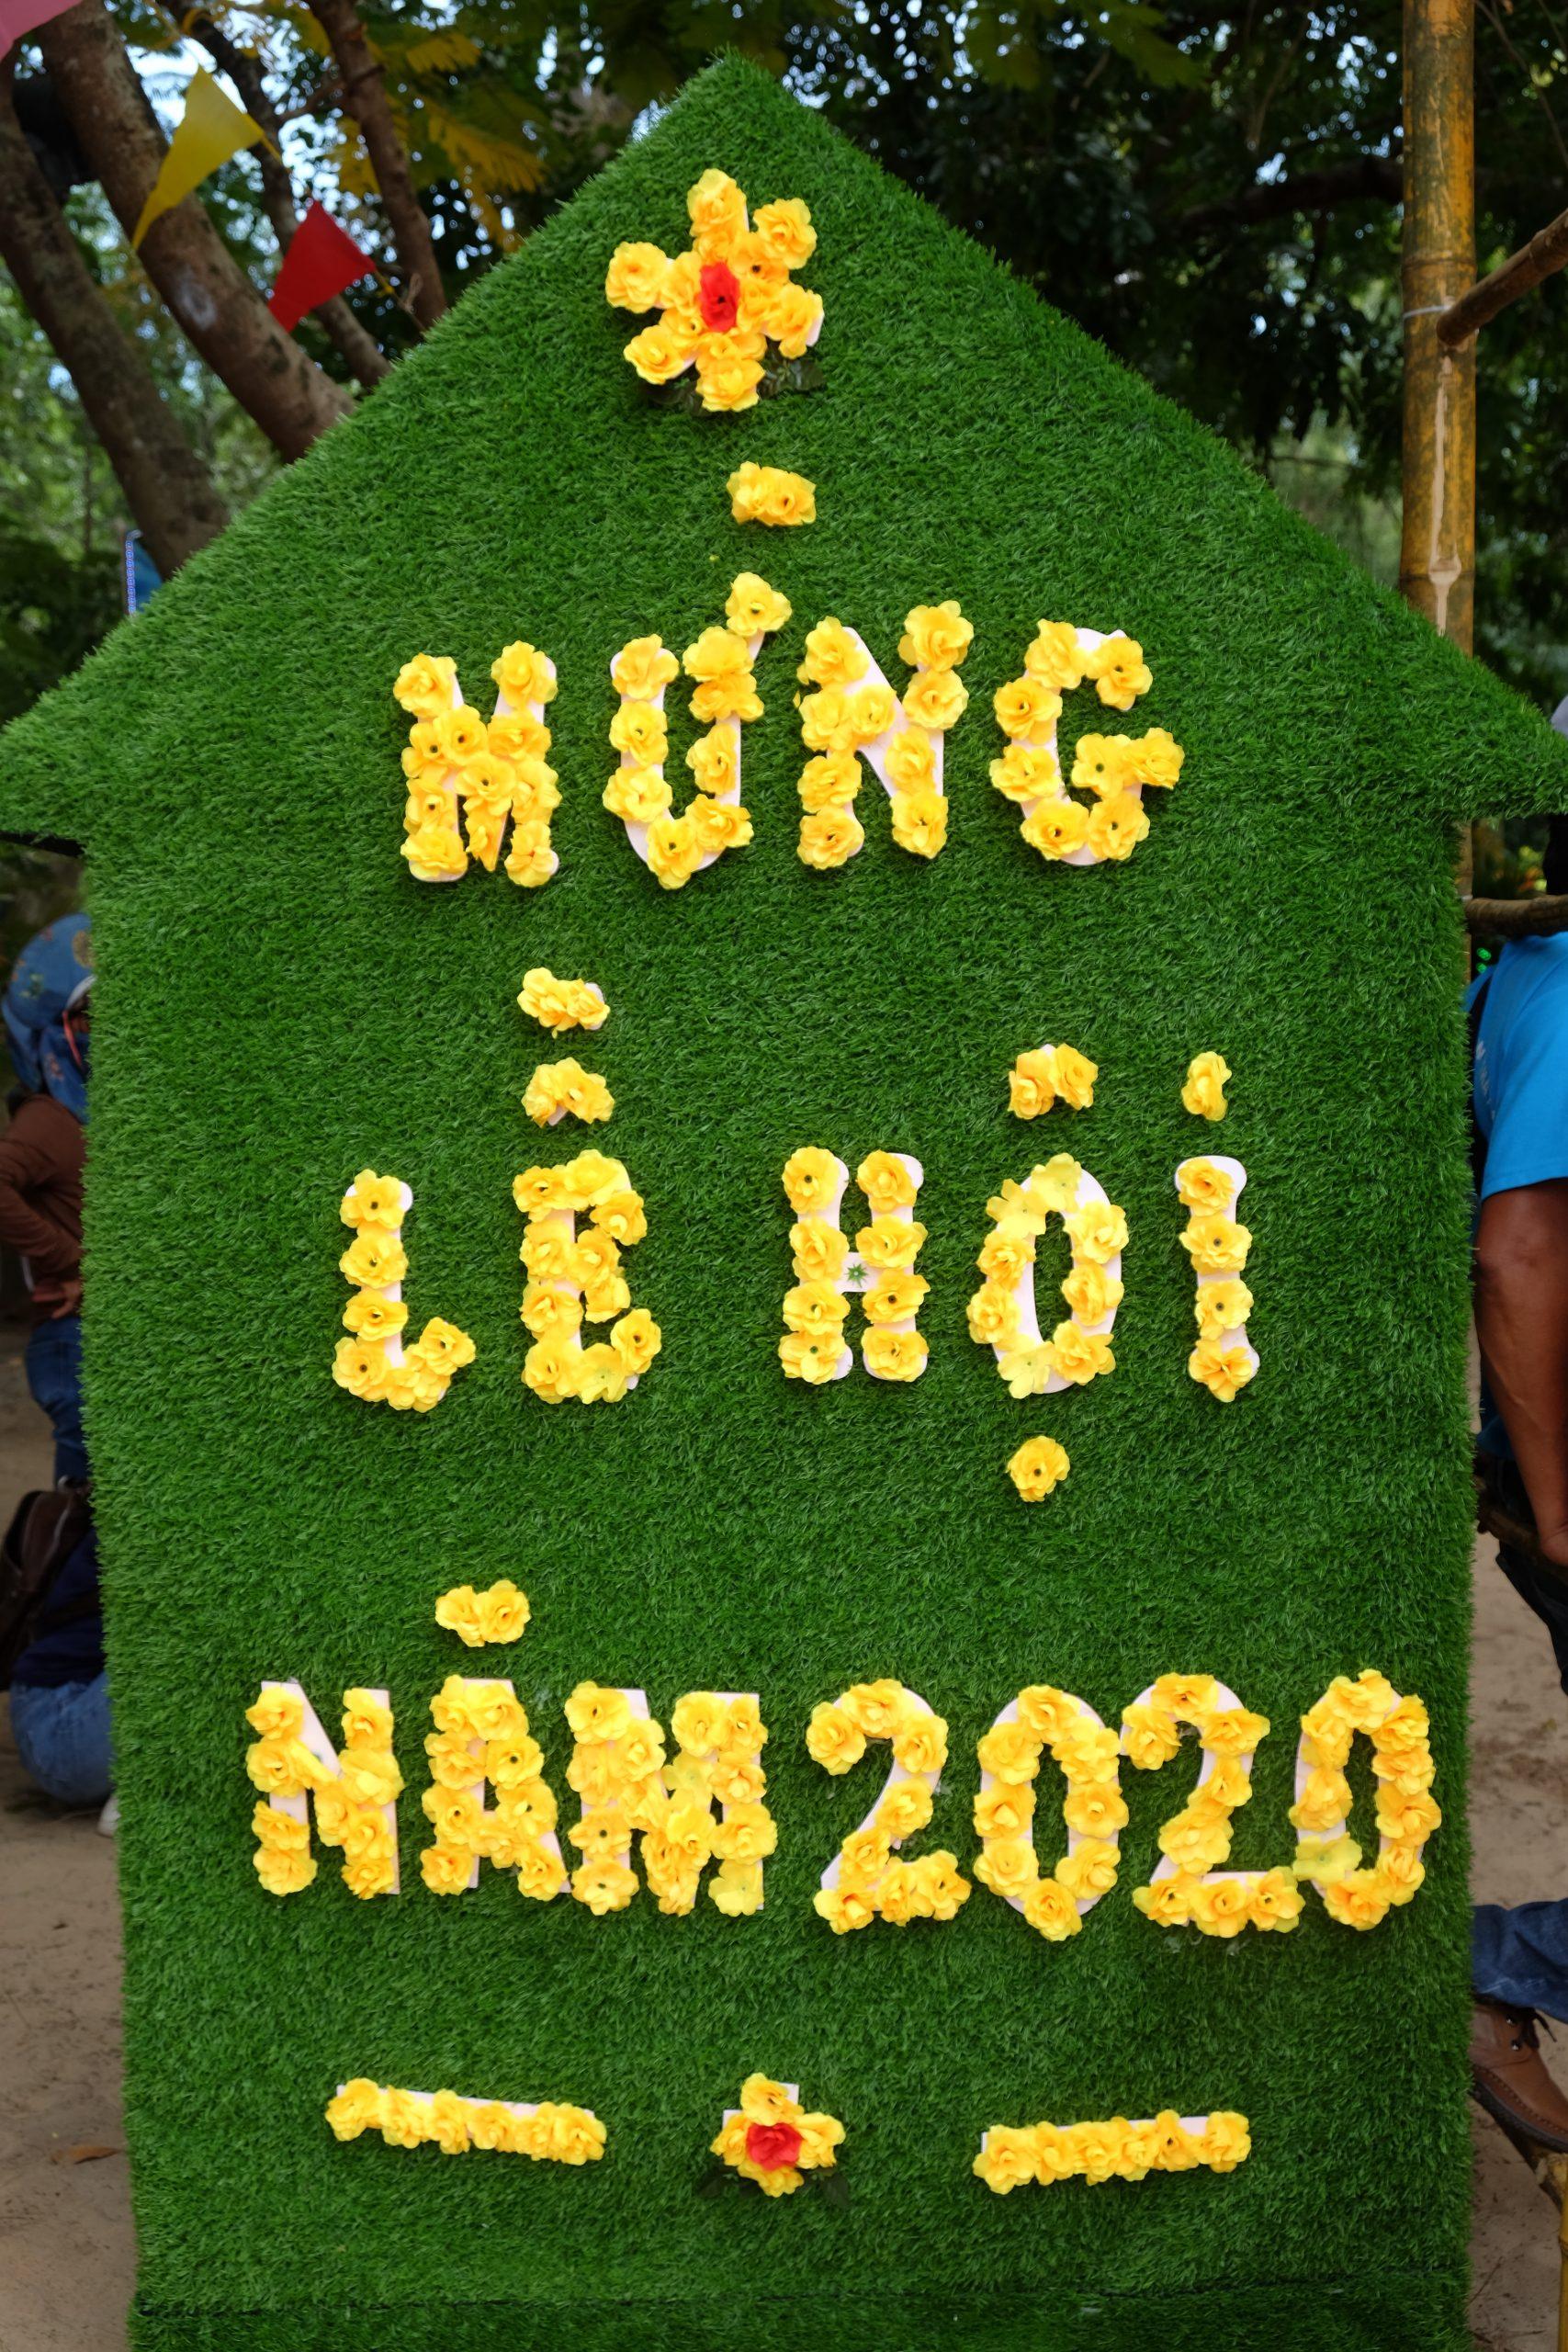 Le hoi dinh Thay Thim 2020 -10